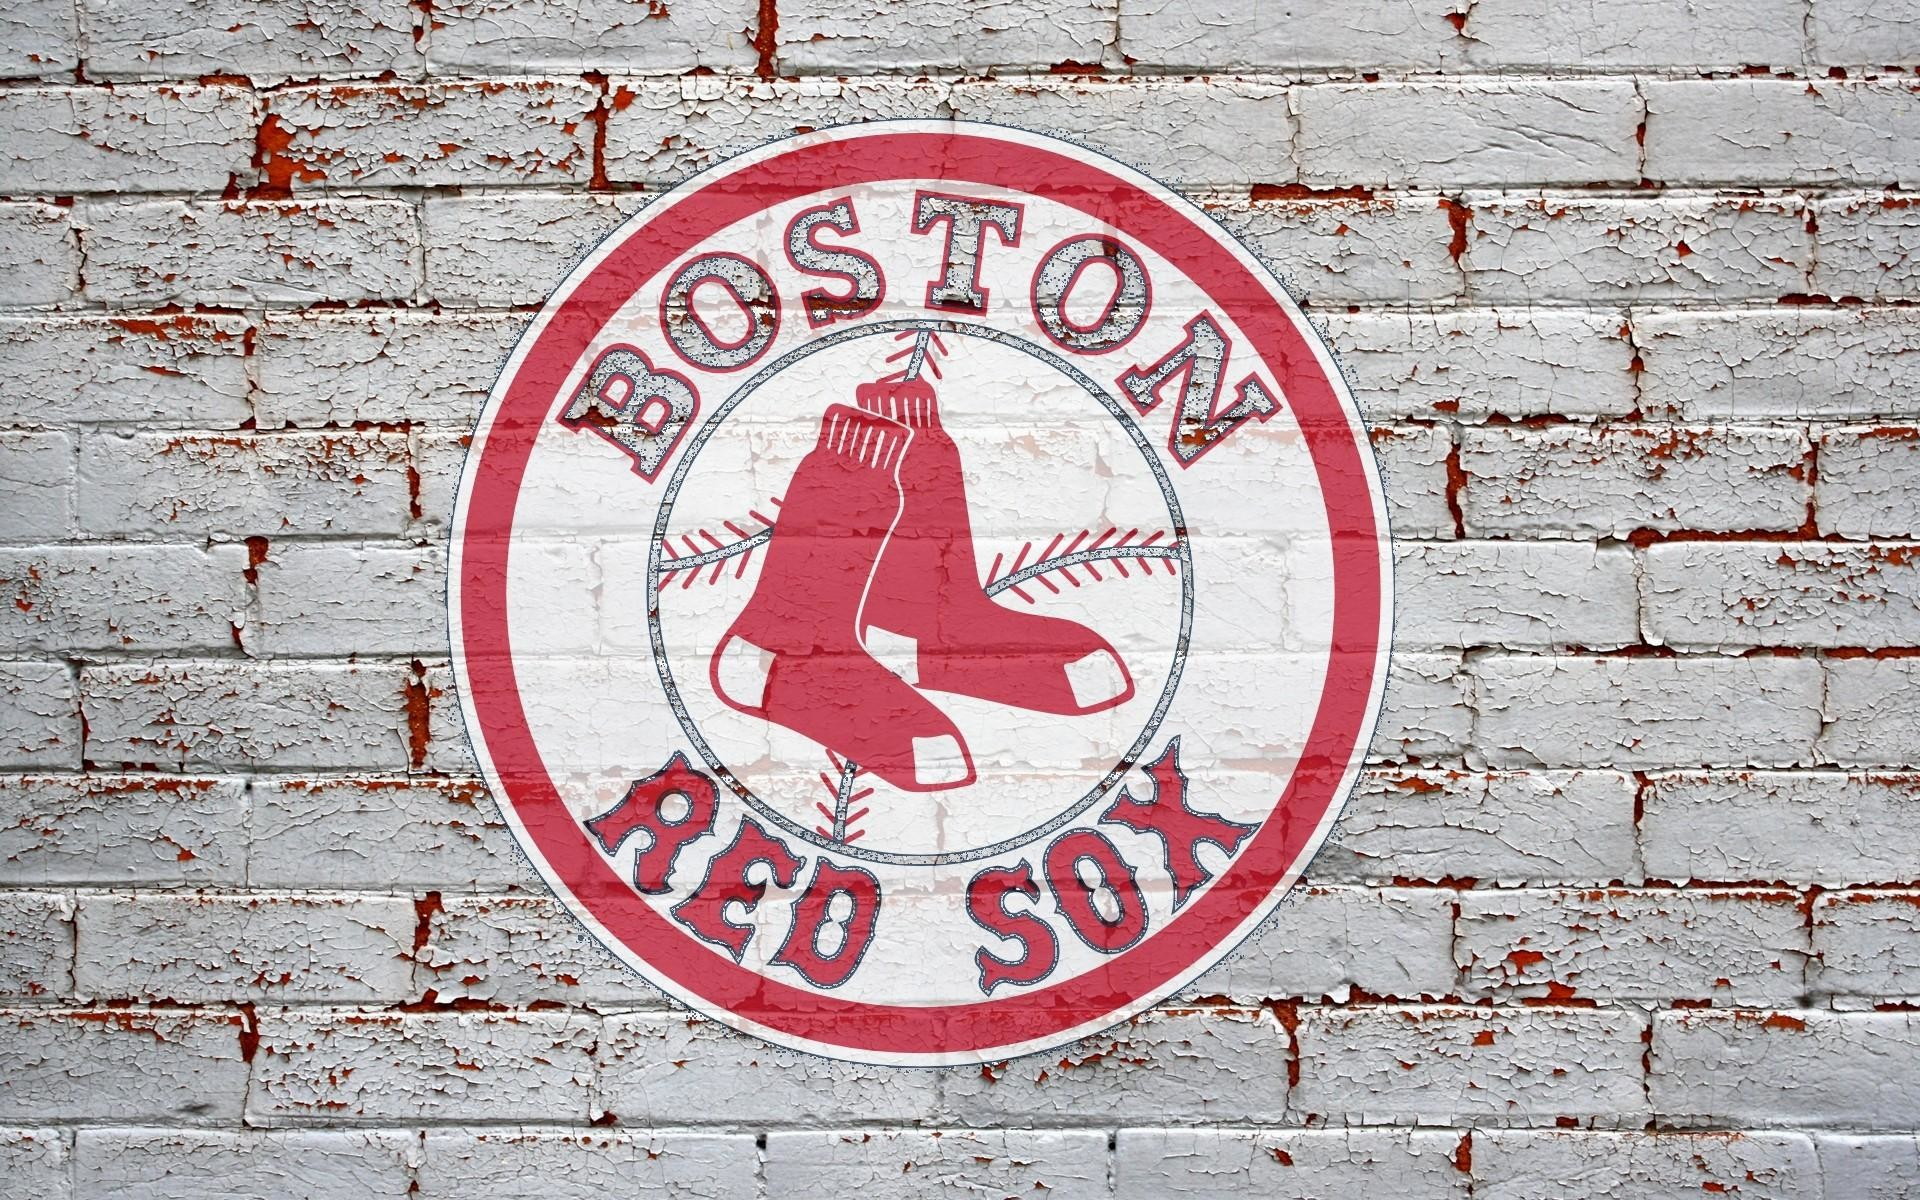 1920x1200 Boston Red Sox Wallpaper